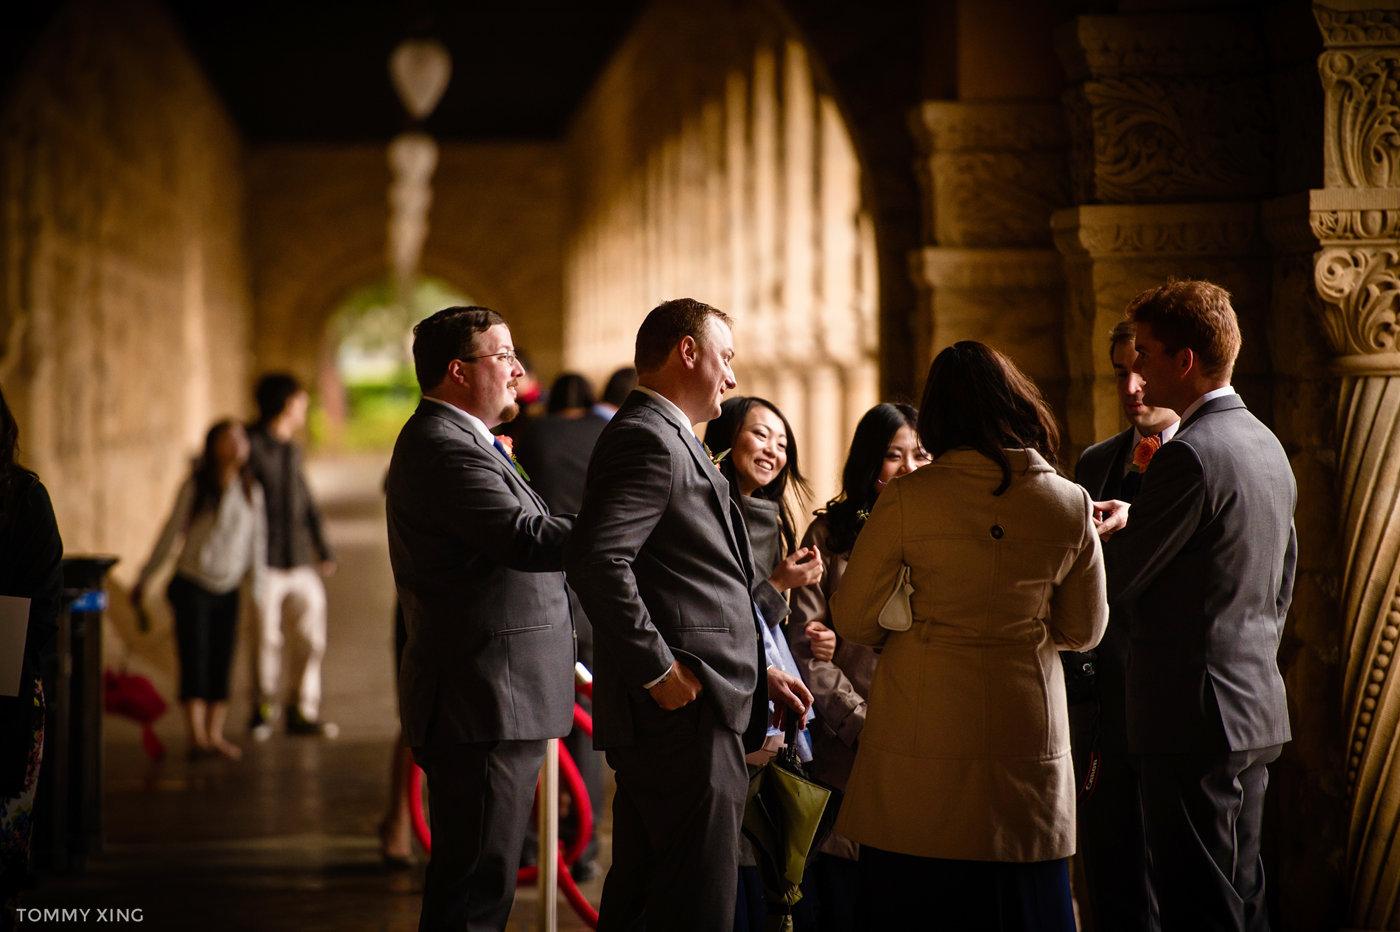 STANFORD MEMORIAL CHURCH WEDDING - Wenjie & Chengcheng - SAN FRANCISCO BAY AREA 斯坦福教堂婚礼跟拍 - 洛杉矶婚礼婚纱照摄影师 Tommy Xing Photography159.jpg